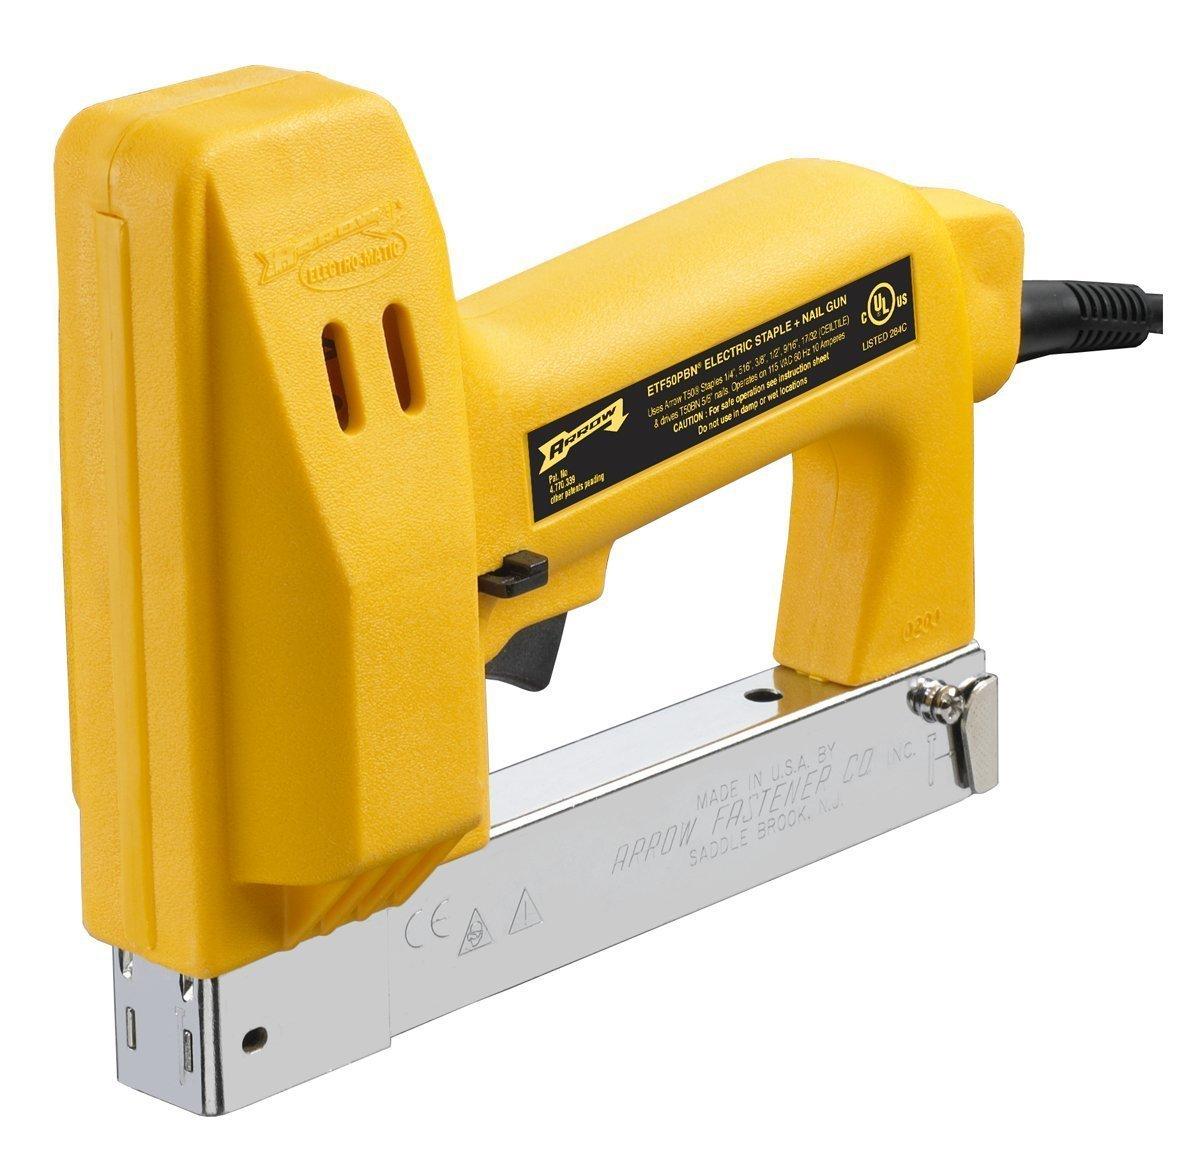 Amazon.com: Arrow Fastener ETF50PBN Pro Heavy Duty Electric Staple ...